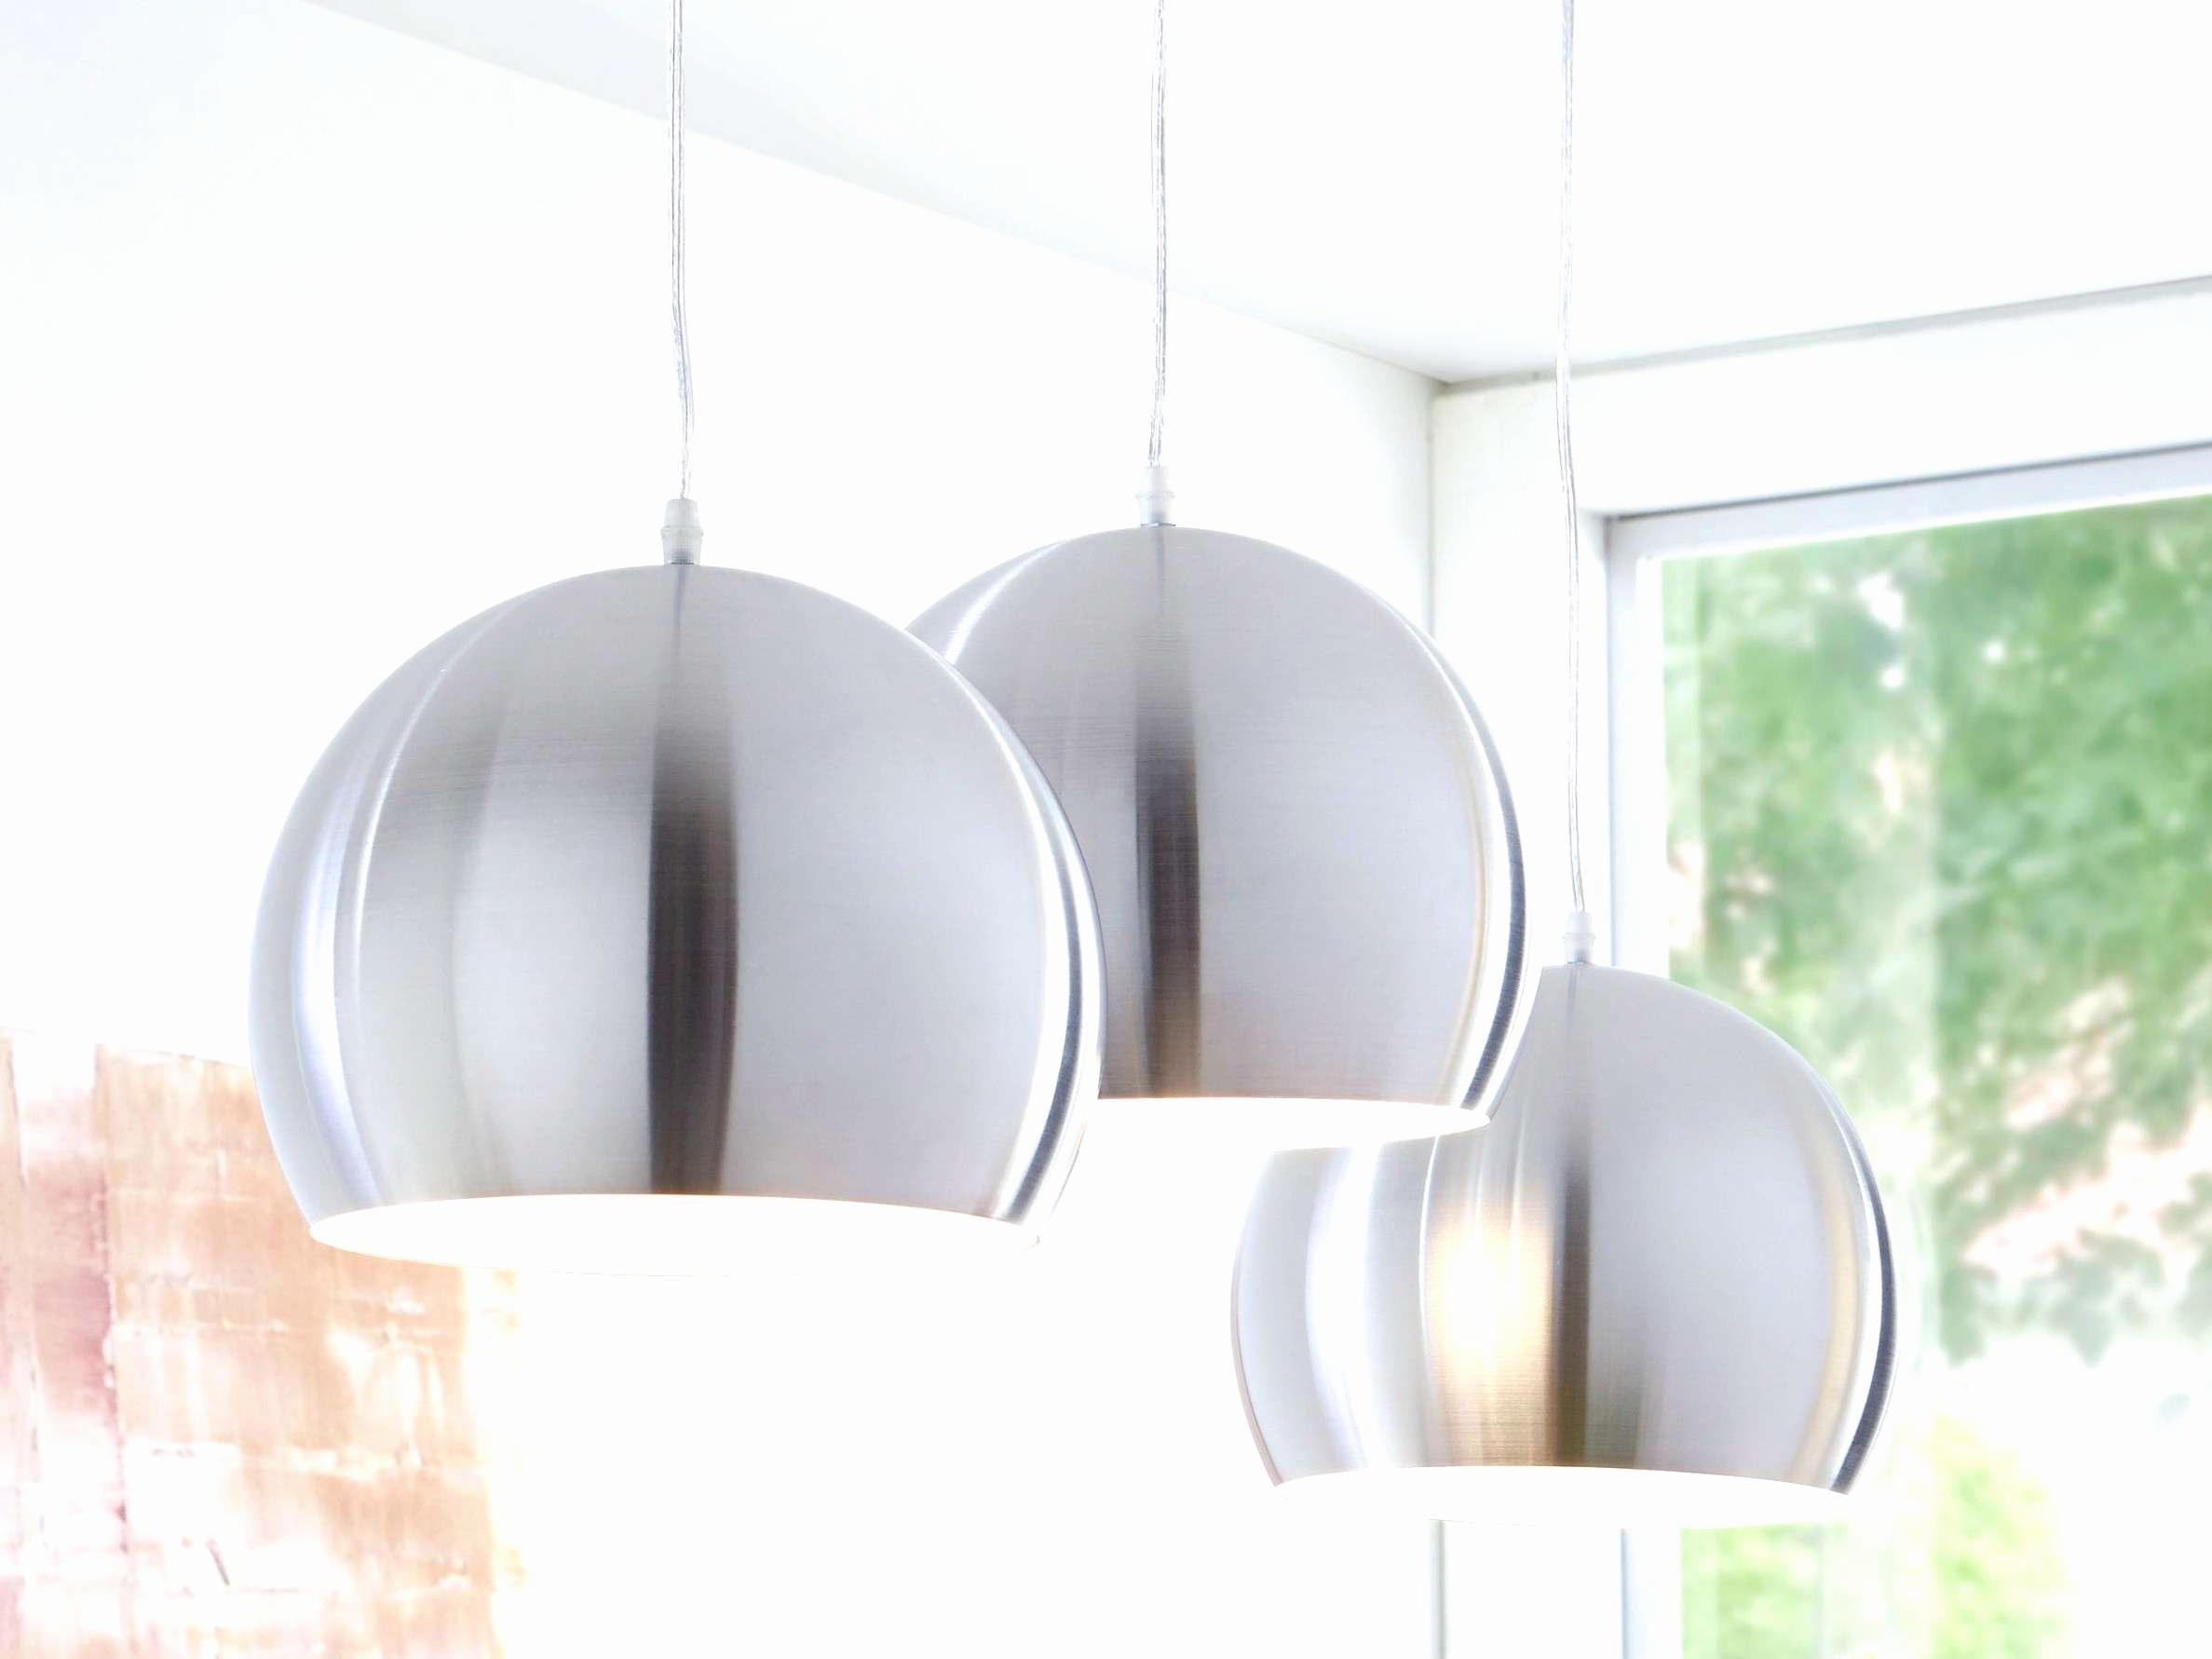 Full Size of Led Deckenleuchte Farbwechsel Einzigartig 24 Led Deckenleuchte Küche Pretty 37 Einzigartig Led Deckenlampe Küche Deckenleuchte Küche